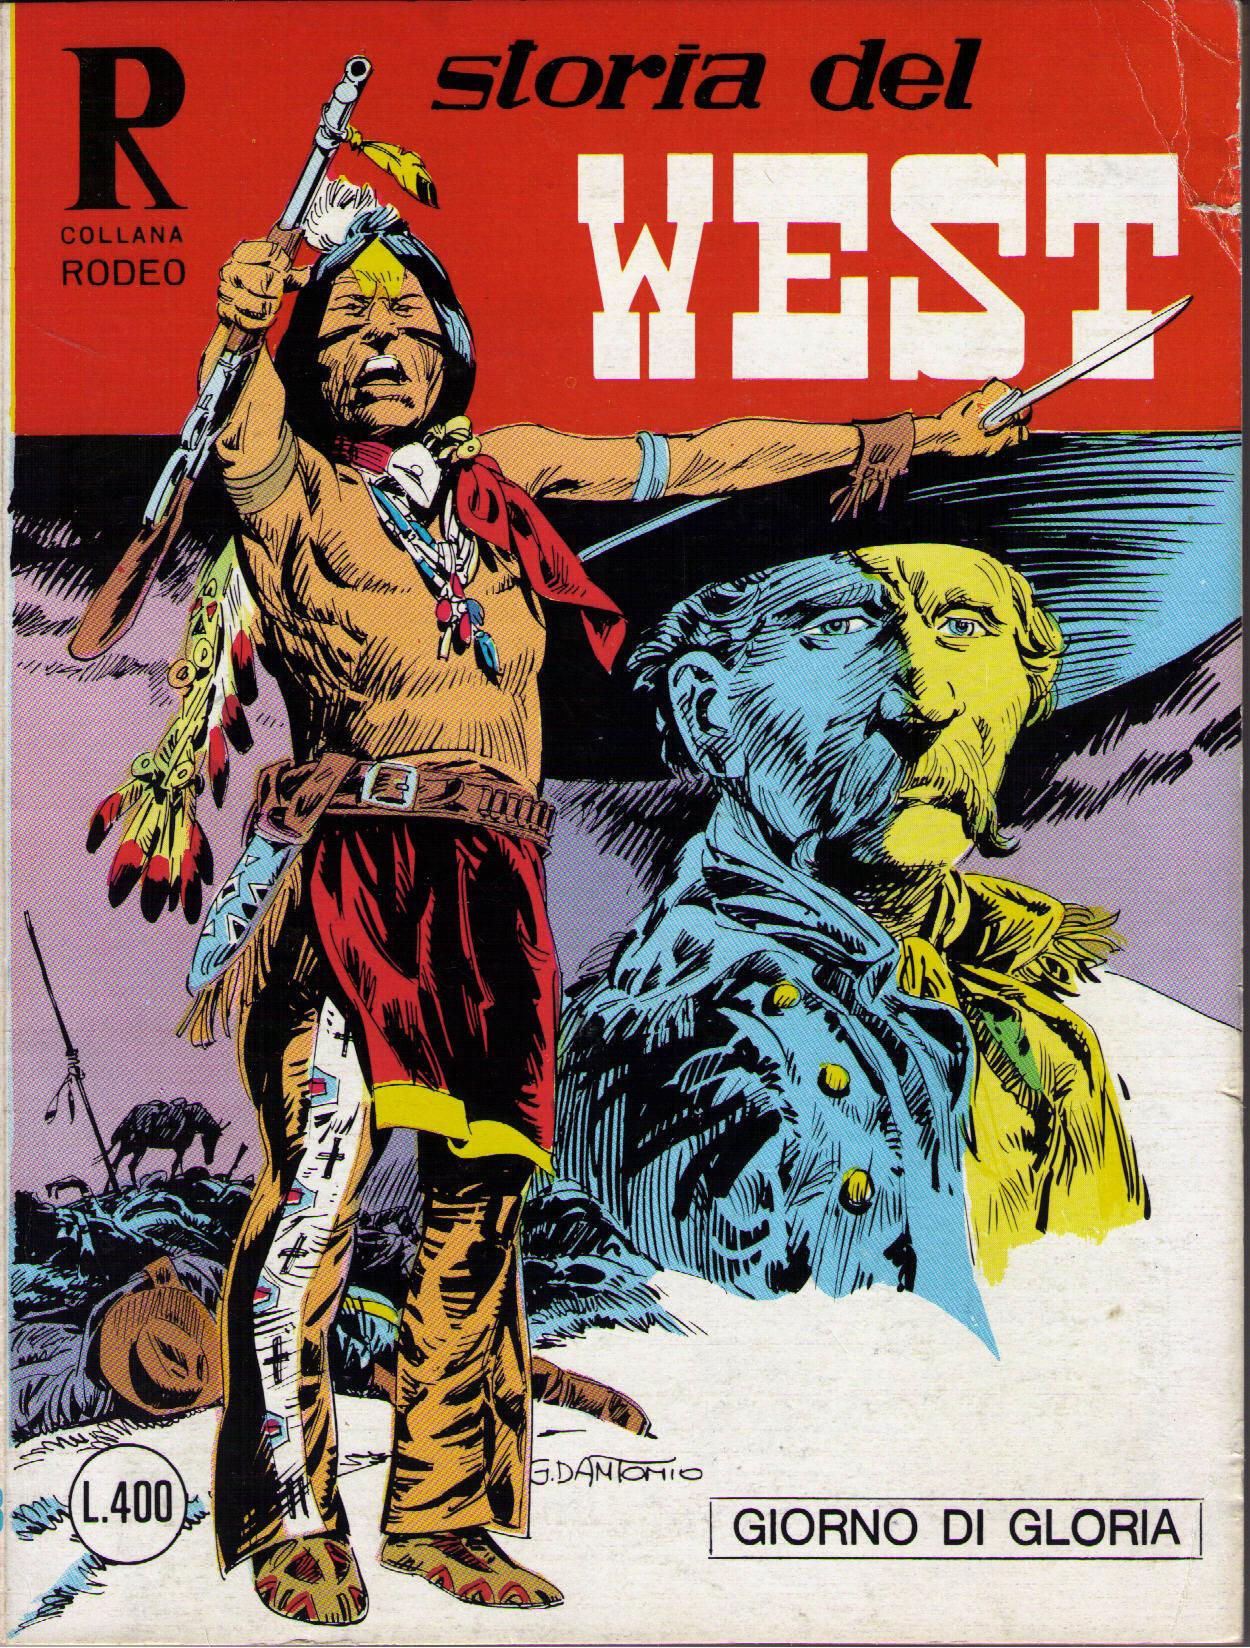 Storia del West n. 58 (Collana Rodeo n. 138)